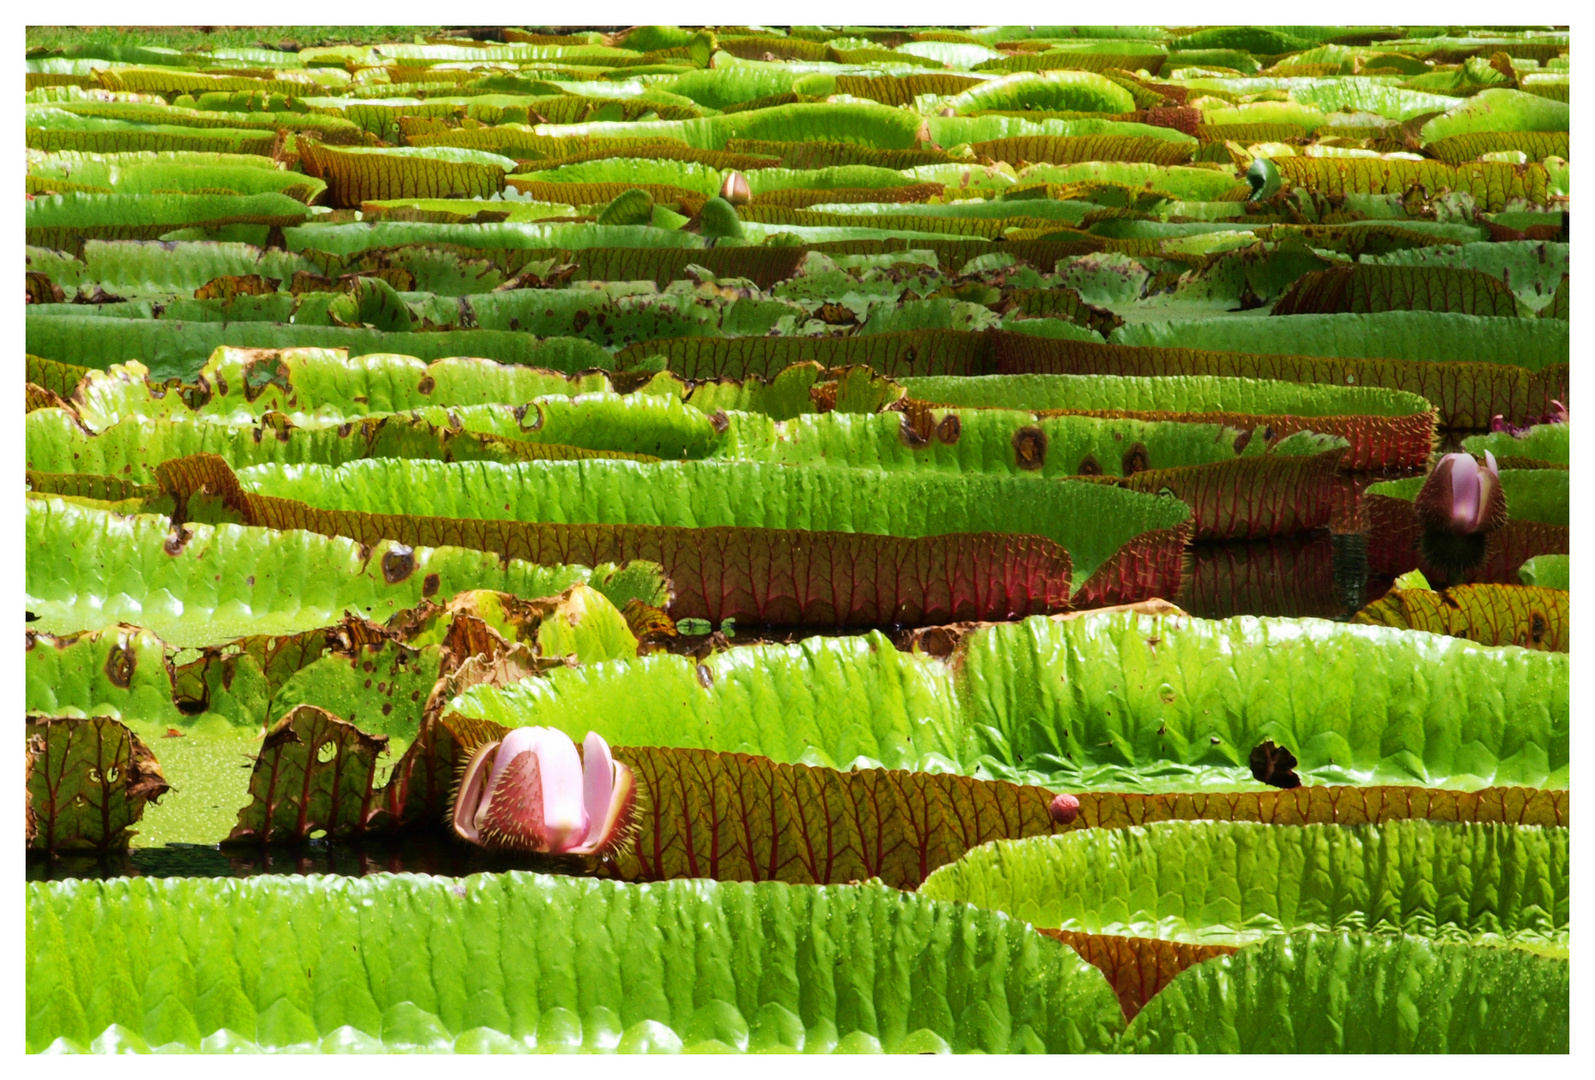 seerosen im botanischen garten von pamplemousses mauritius foto bild pflanzen pilze. Black Bedroom Furniture Sets. Home Design Ideas